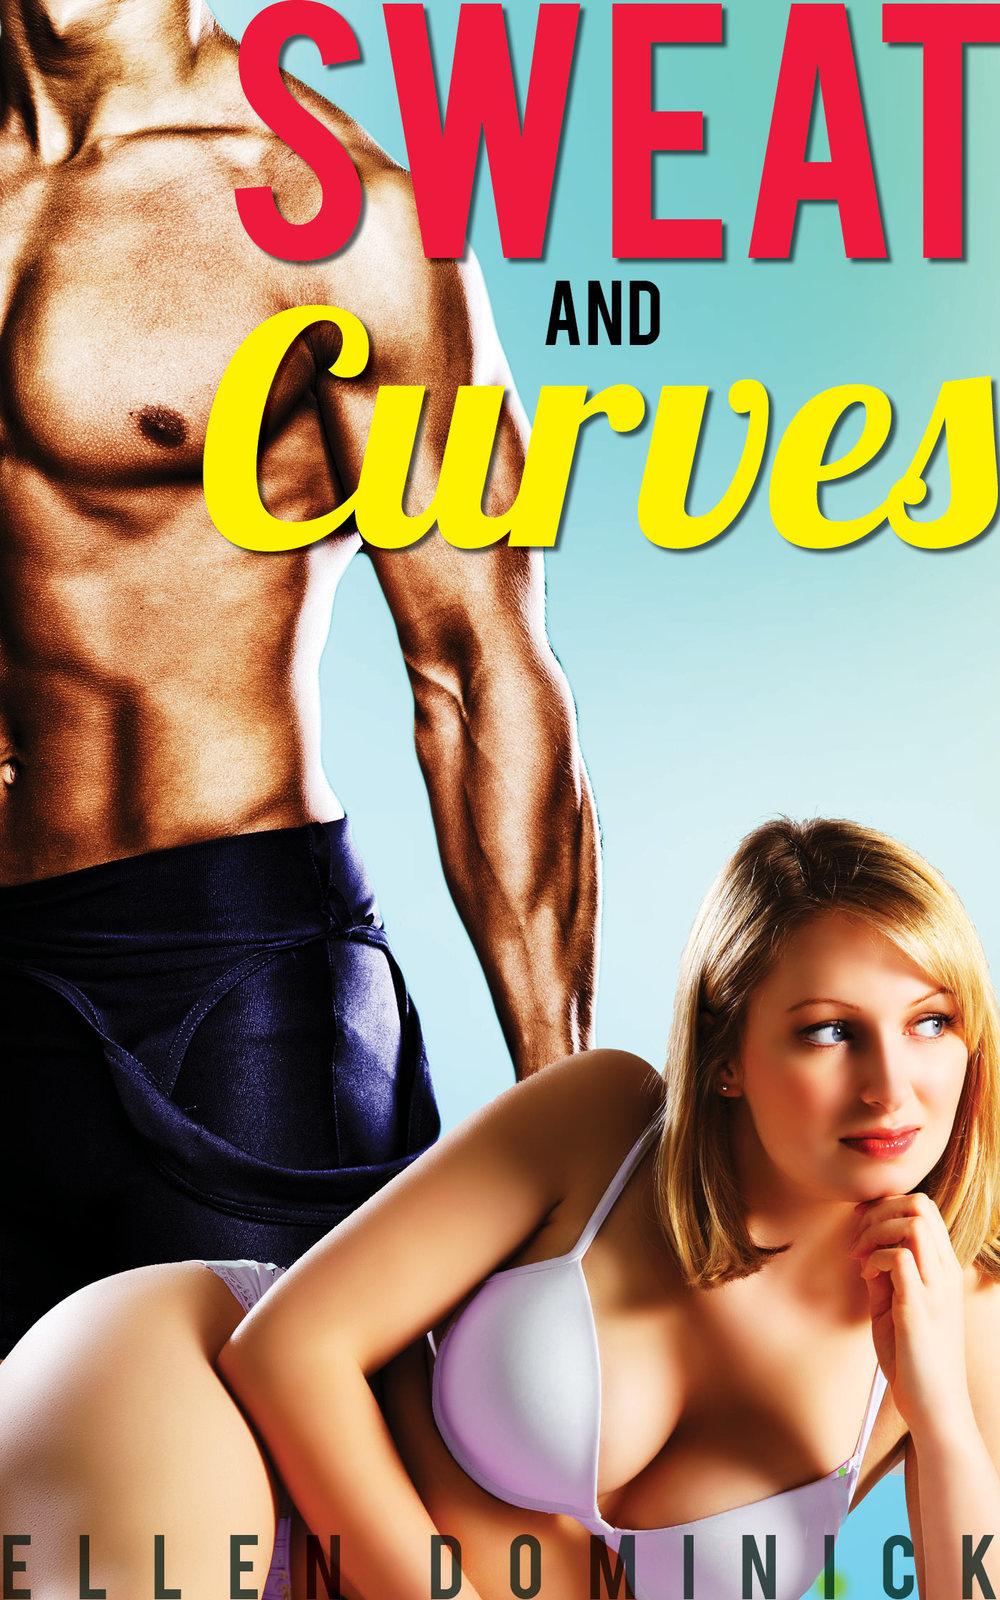 sweatcurves2.jpg